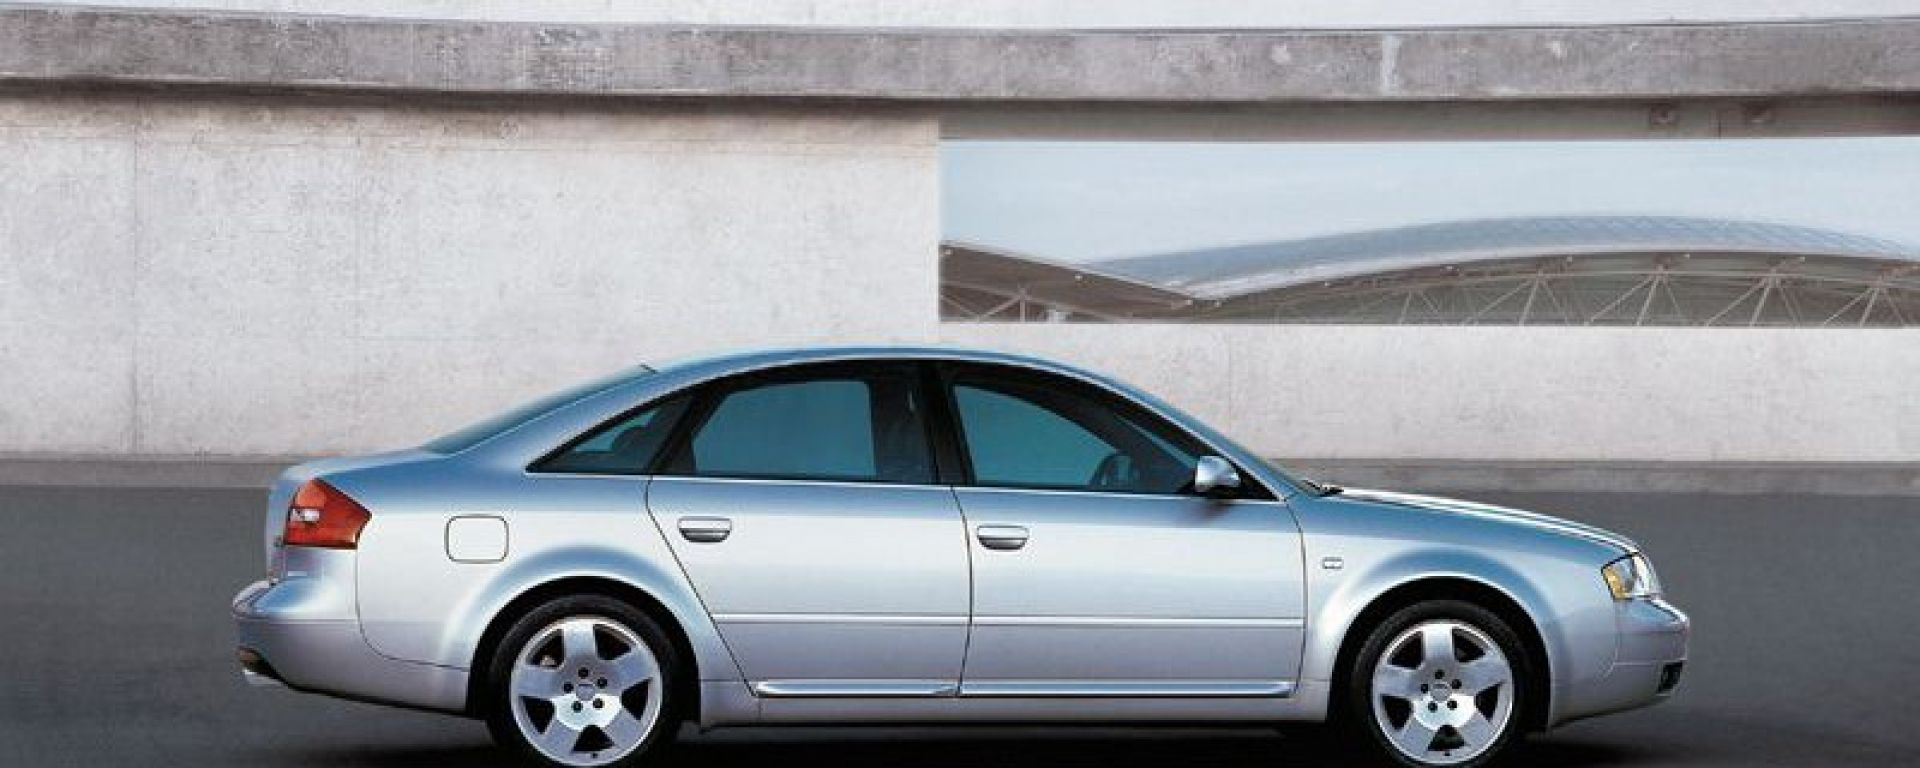 Audi A6 my 2002